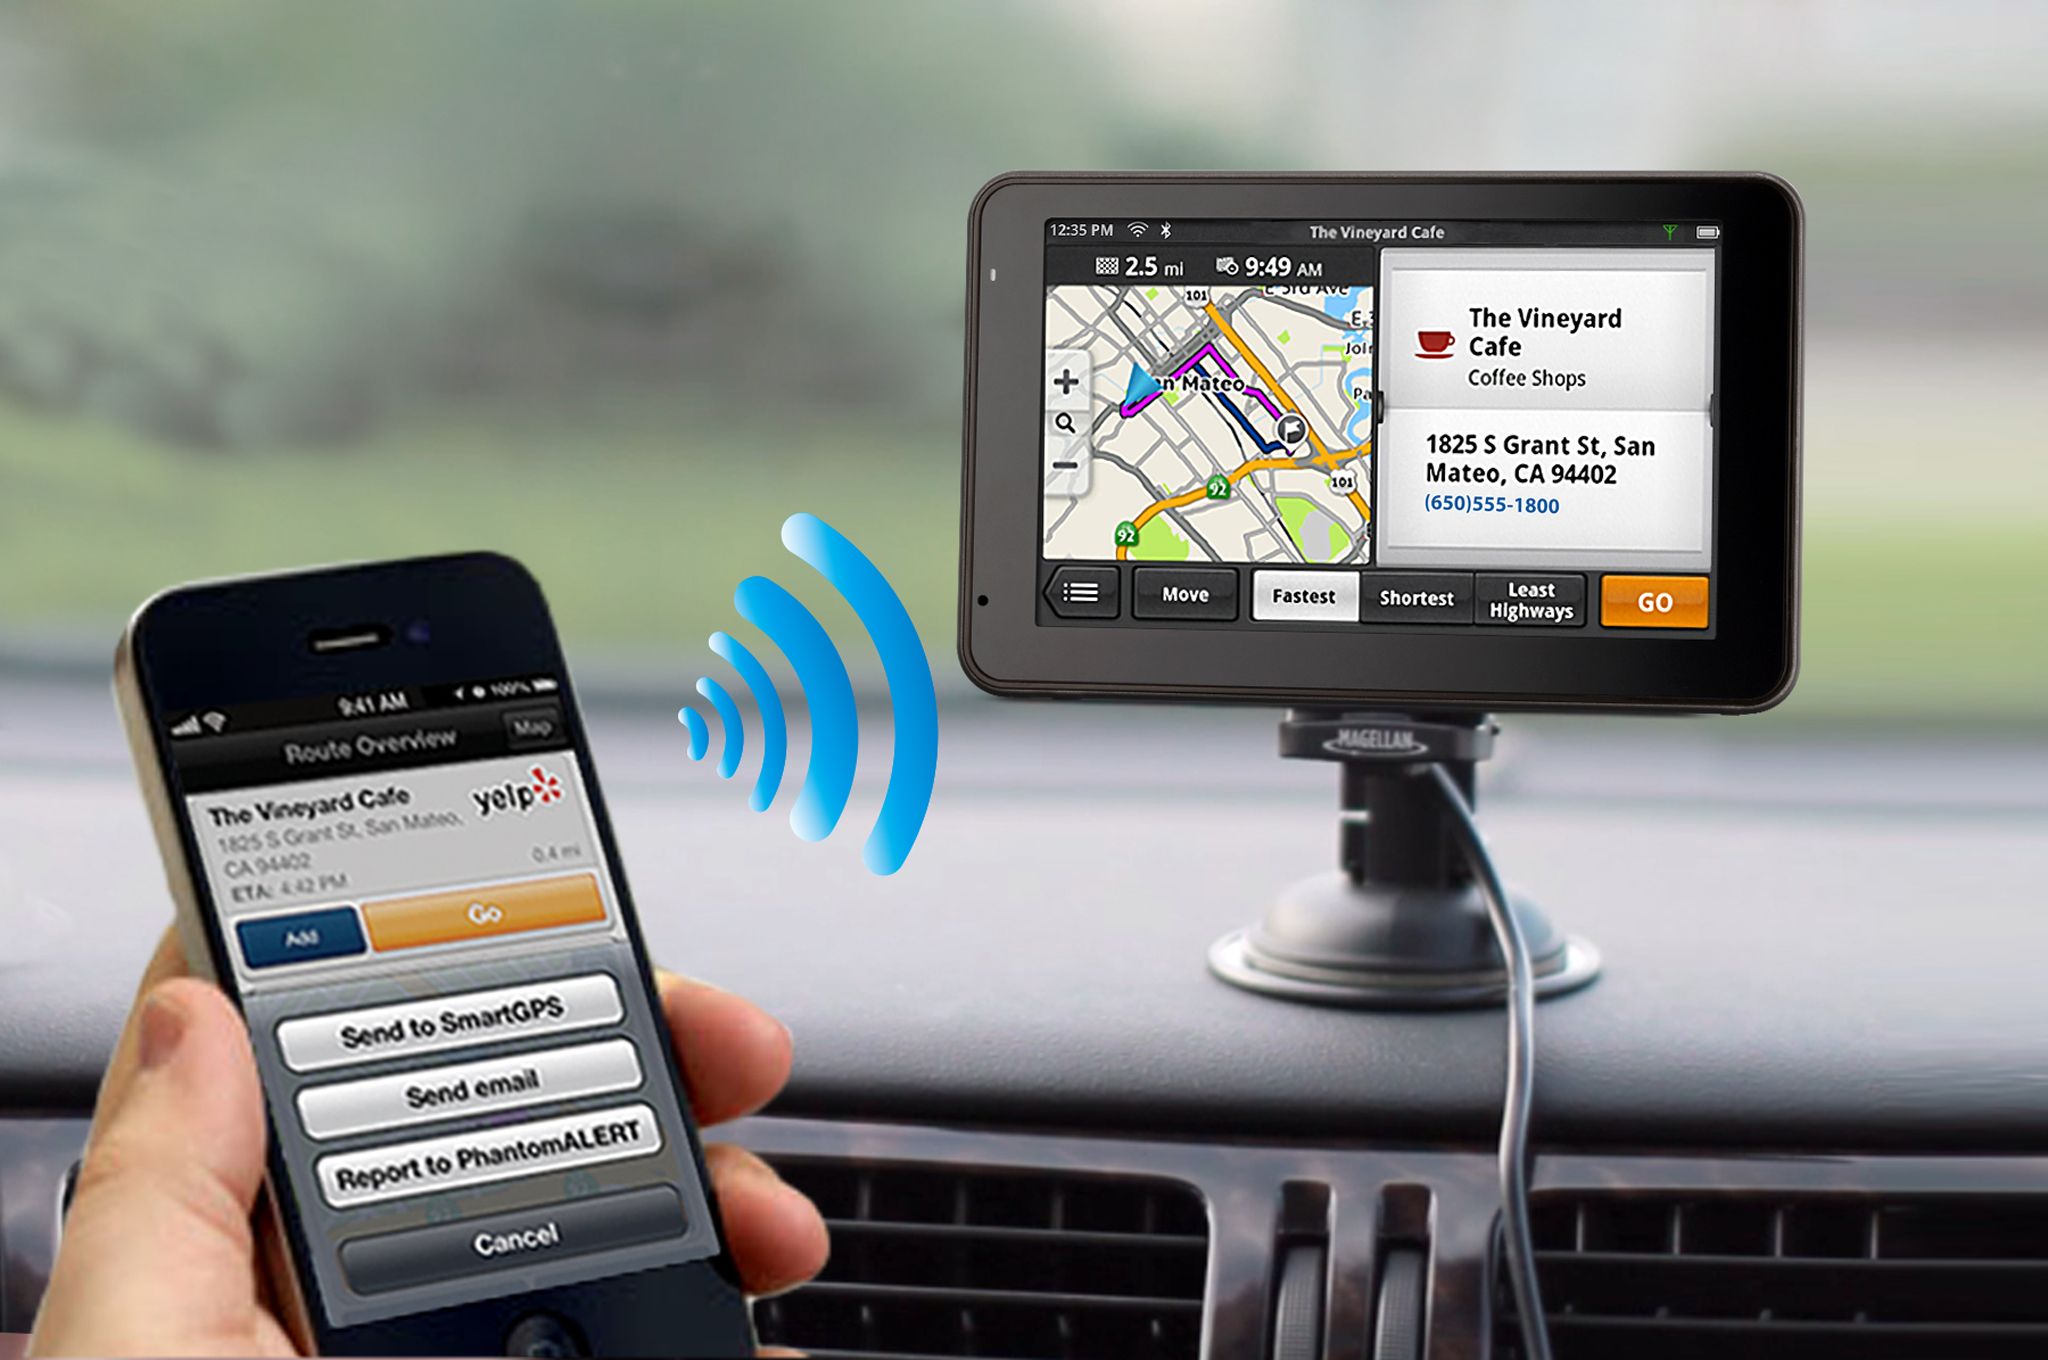 Magellan Announces SmartGPS Navigation App Integration With Bosch SoftTec's mySPIN Platform